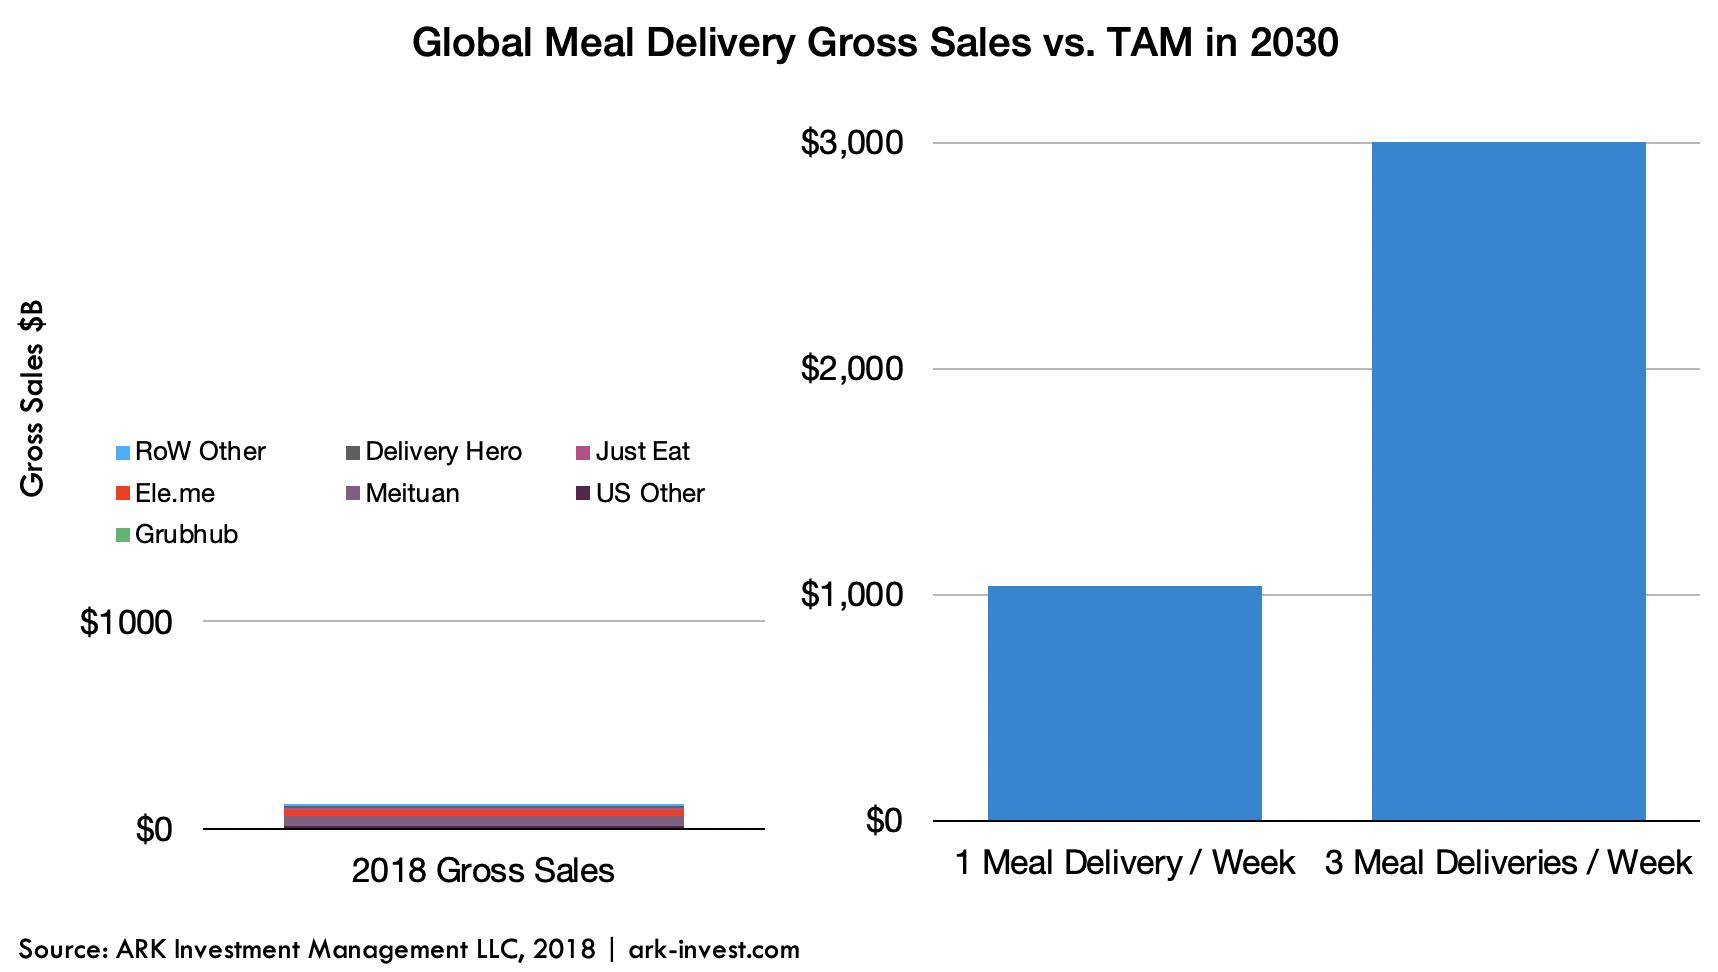 ARK Invest Global Meal Delivery Sales